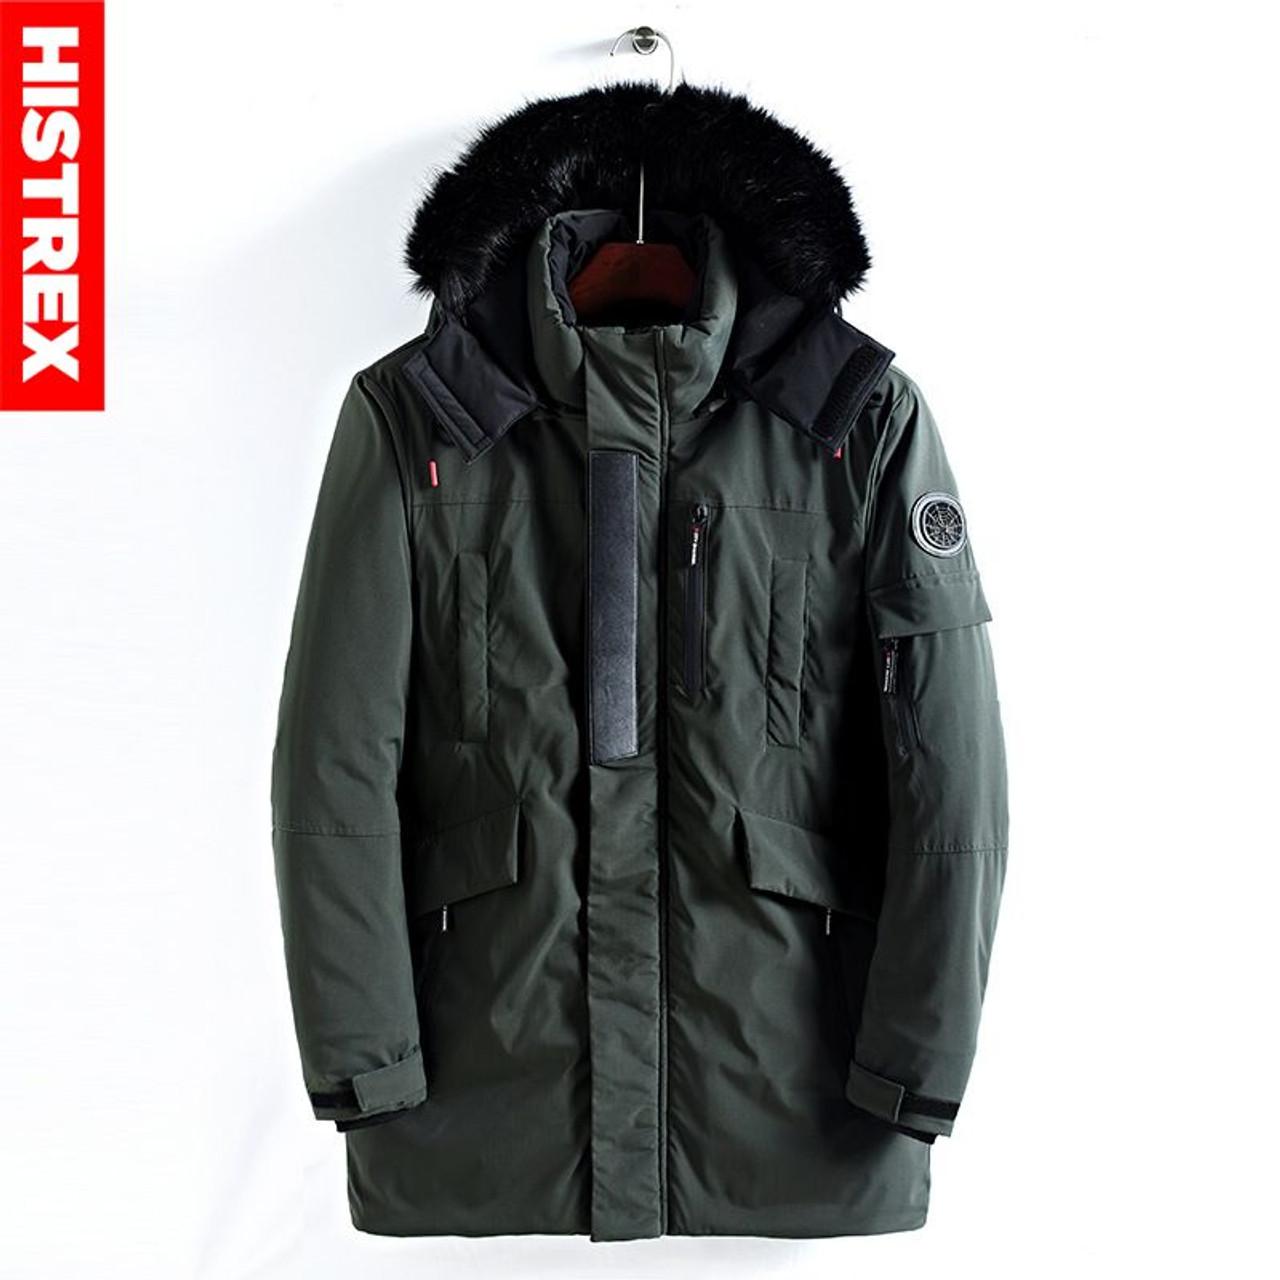 dcf76c9bd HISTREX Men Parkas Winter Jacket Fur Hooded Coat Long Jacket Mens Parka  Padded Thick Overcoat Army Wine Plus Size 3XL 4XL HP3DF#